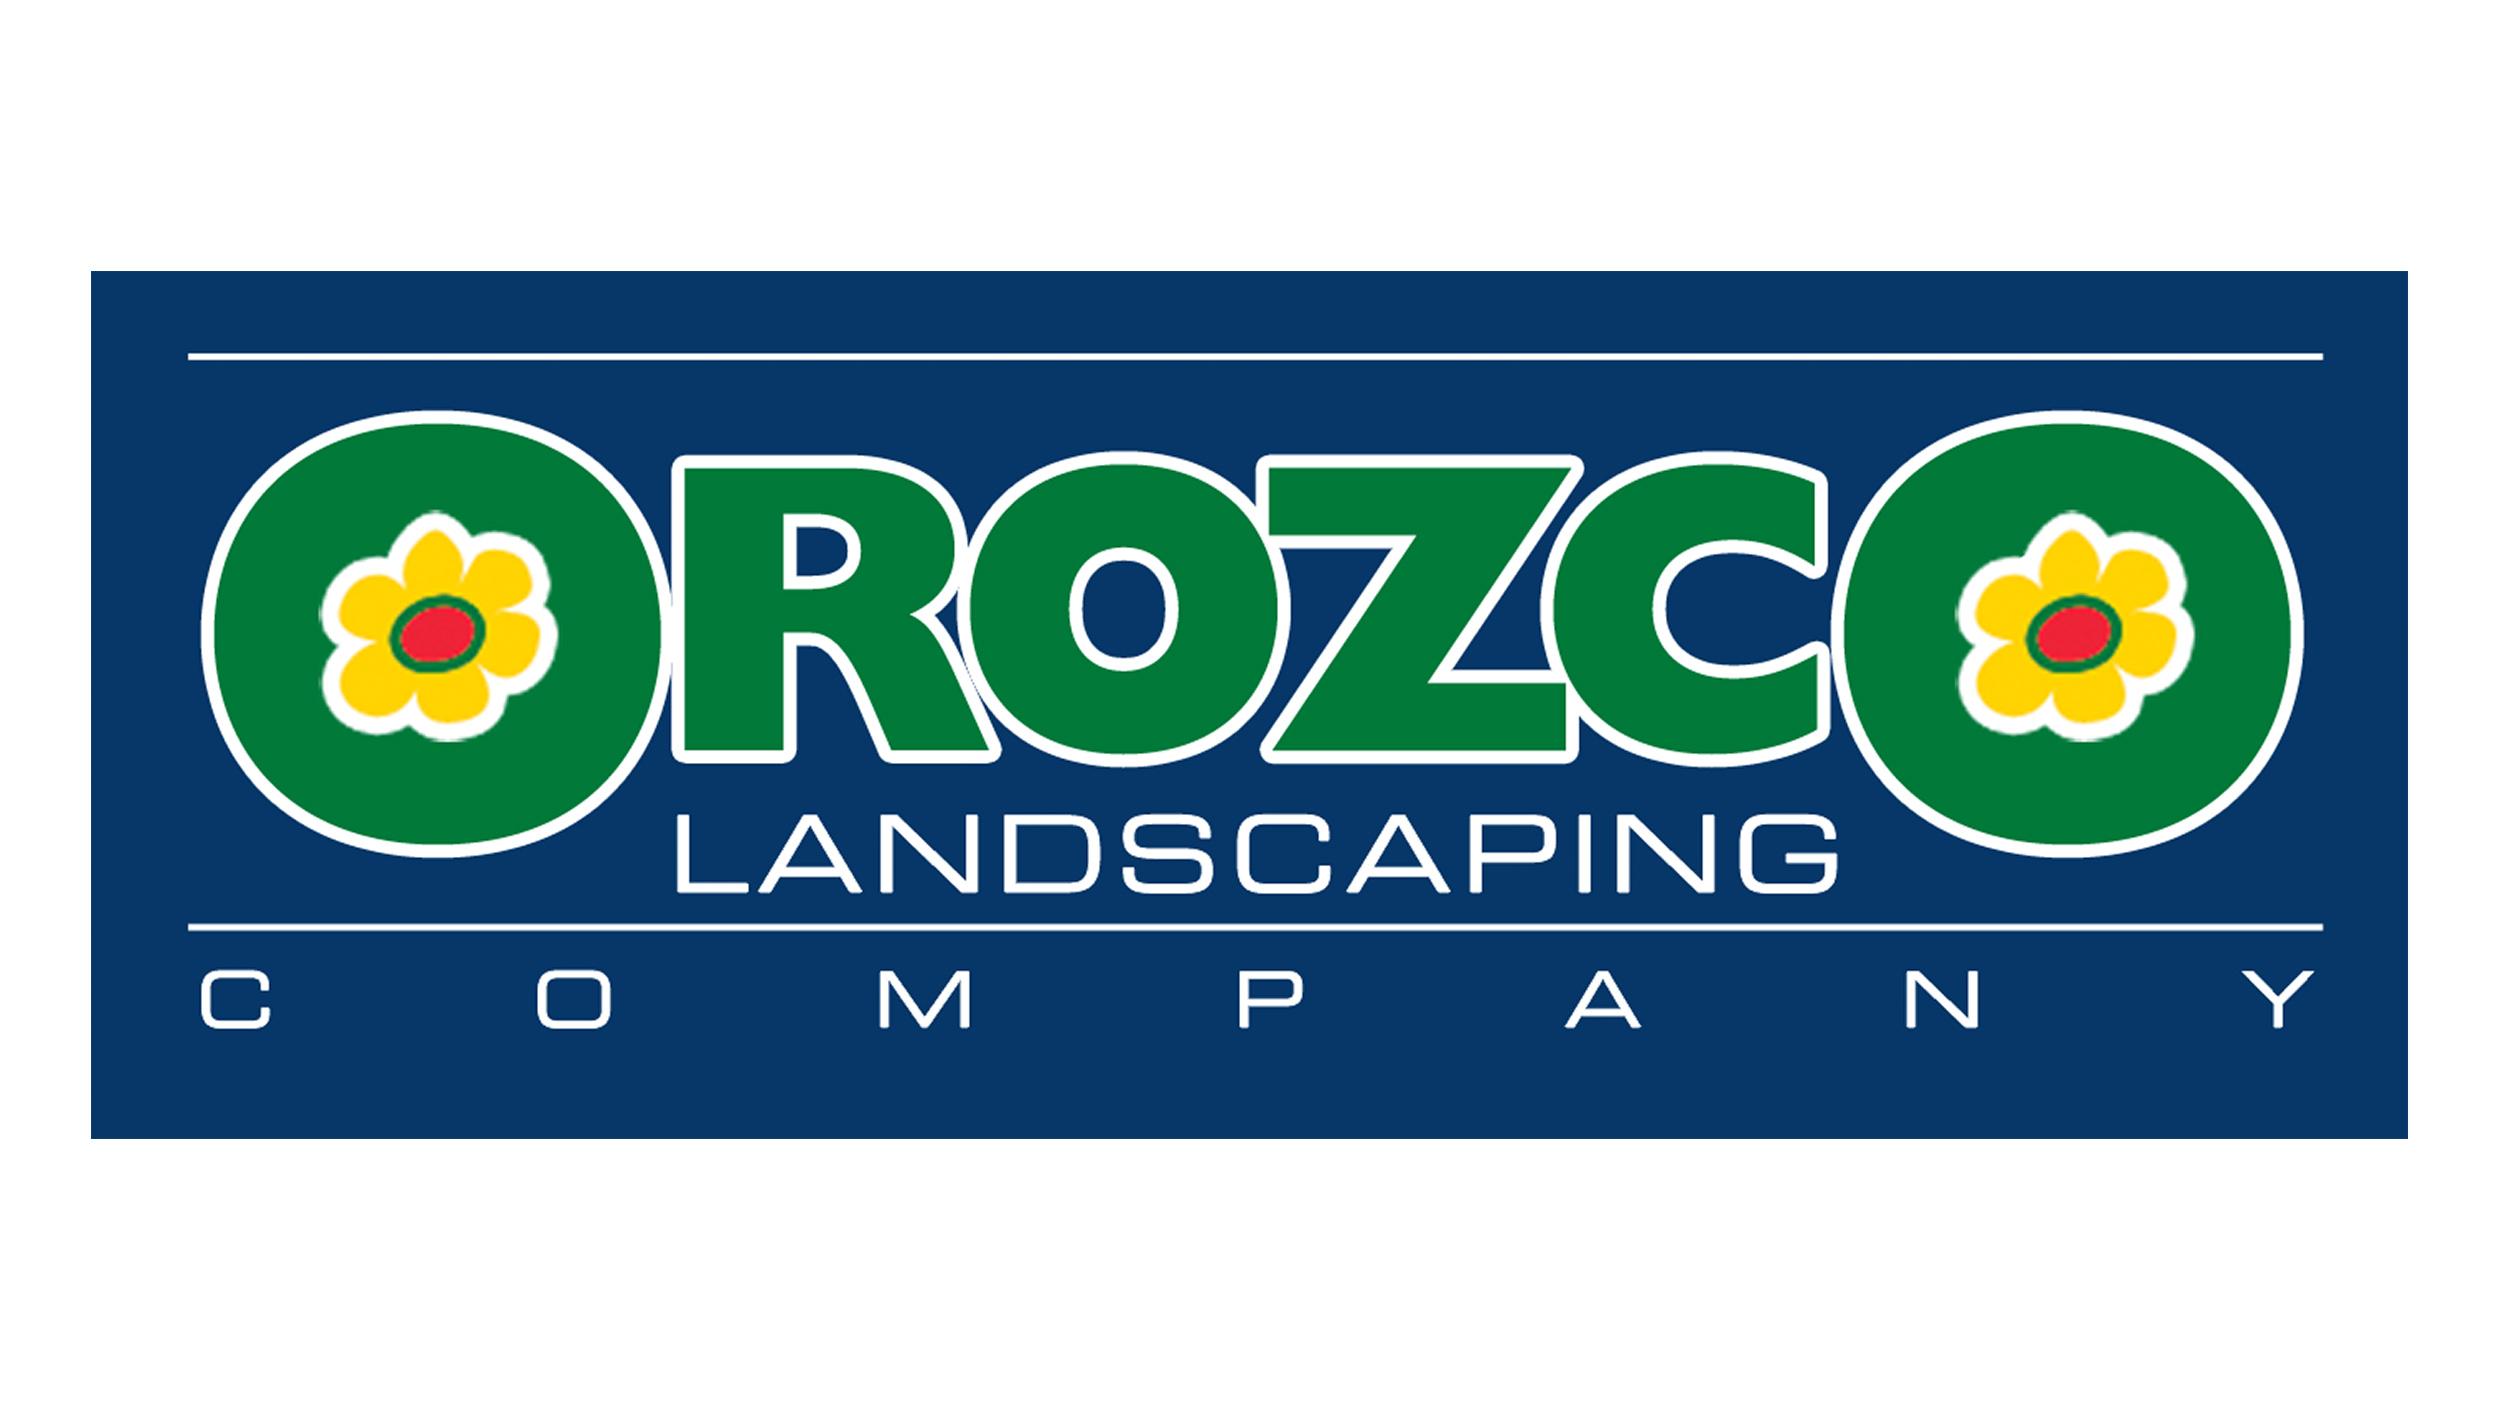 Orozco-landscaping-Logos-Brand-Identity.jpg